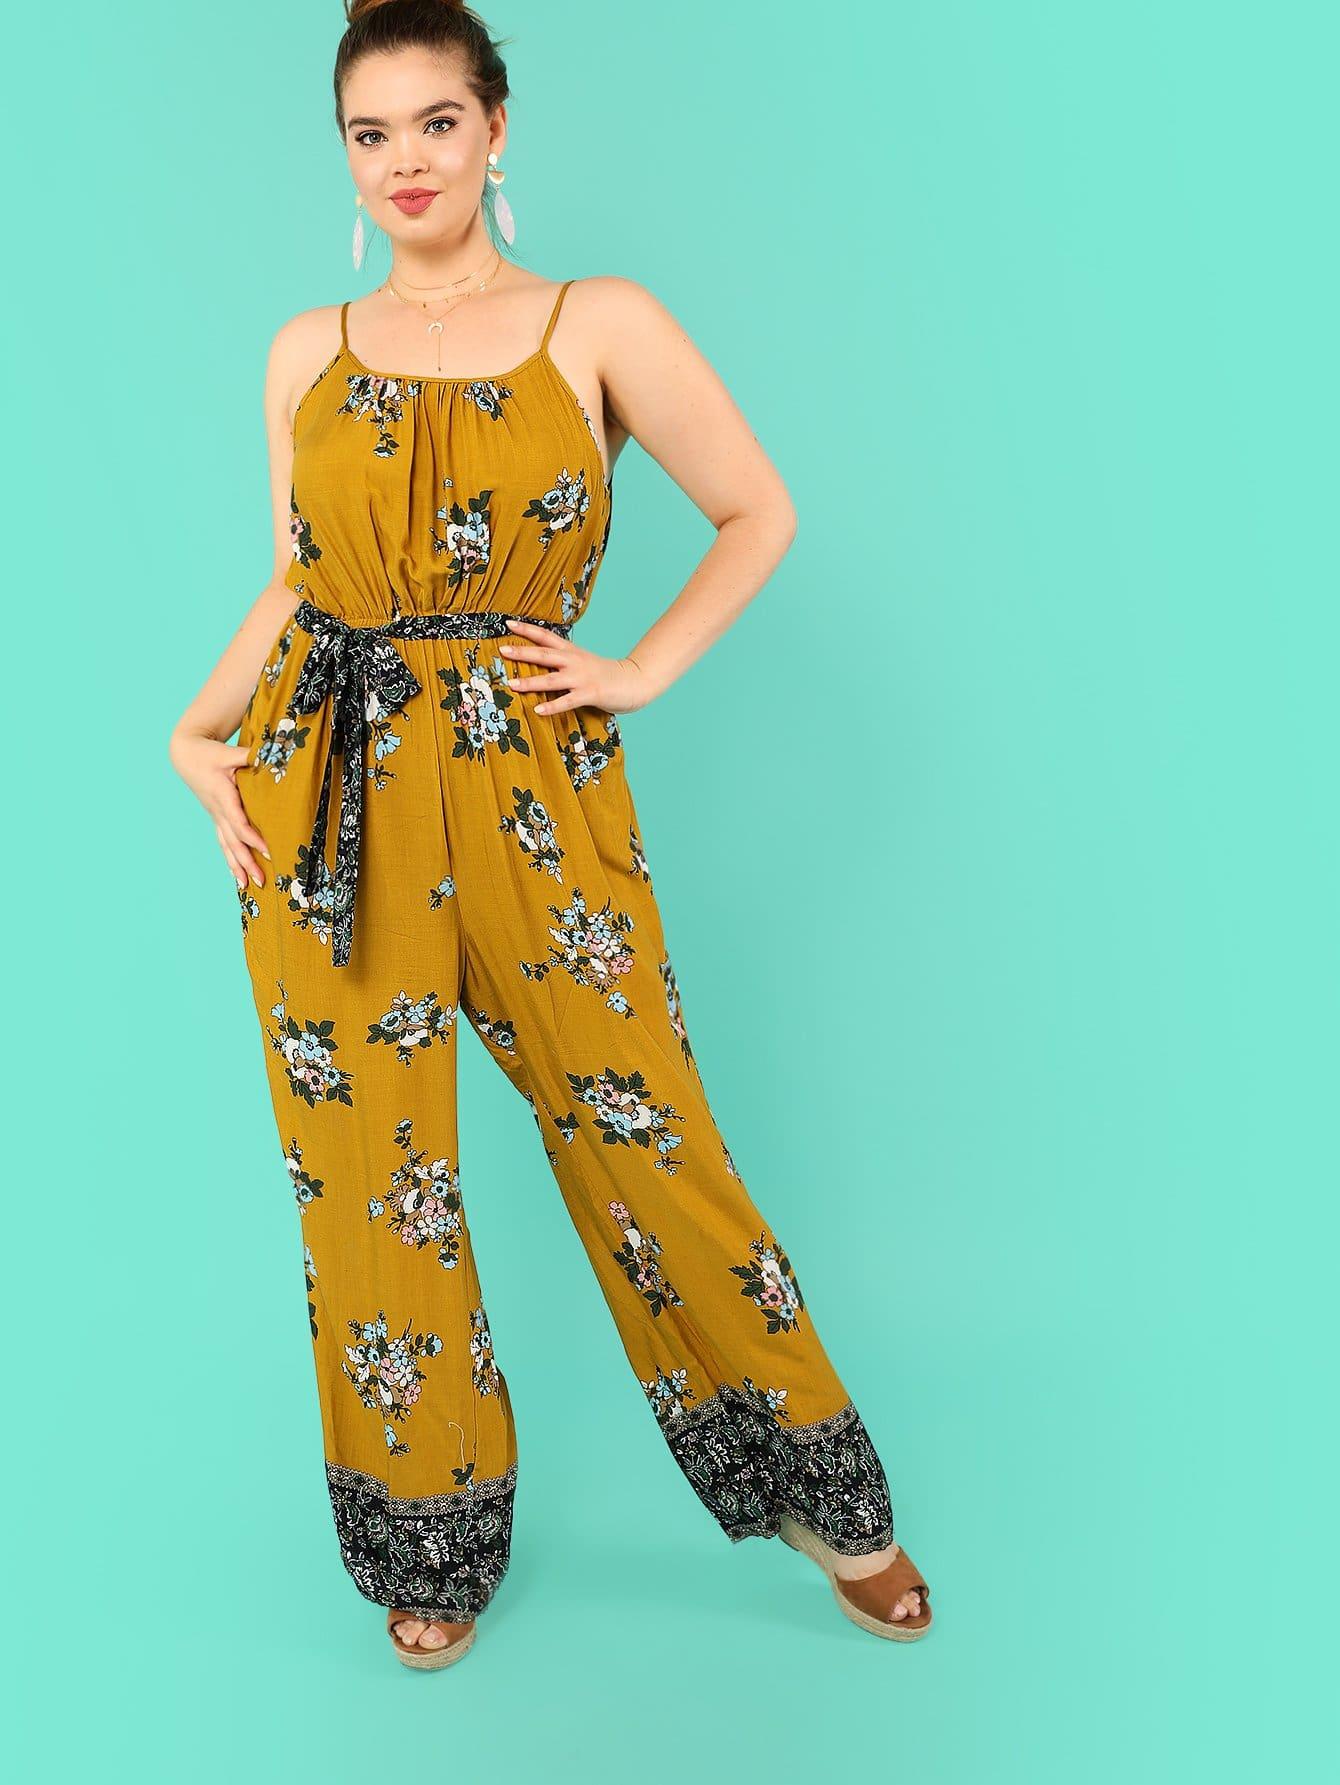 Ruffle Embellished Flower Print Cami Jumpsuit ruffle embellished flower print cami jumpsuit